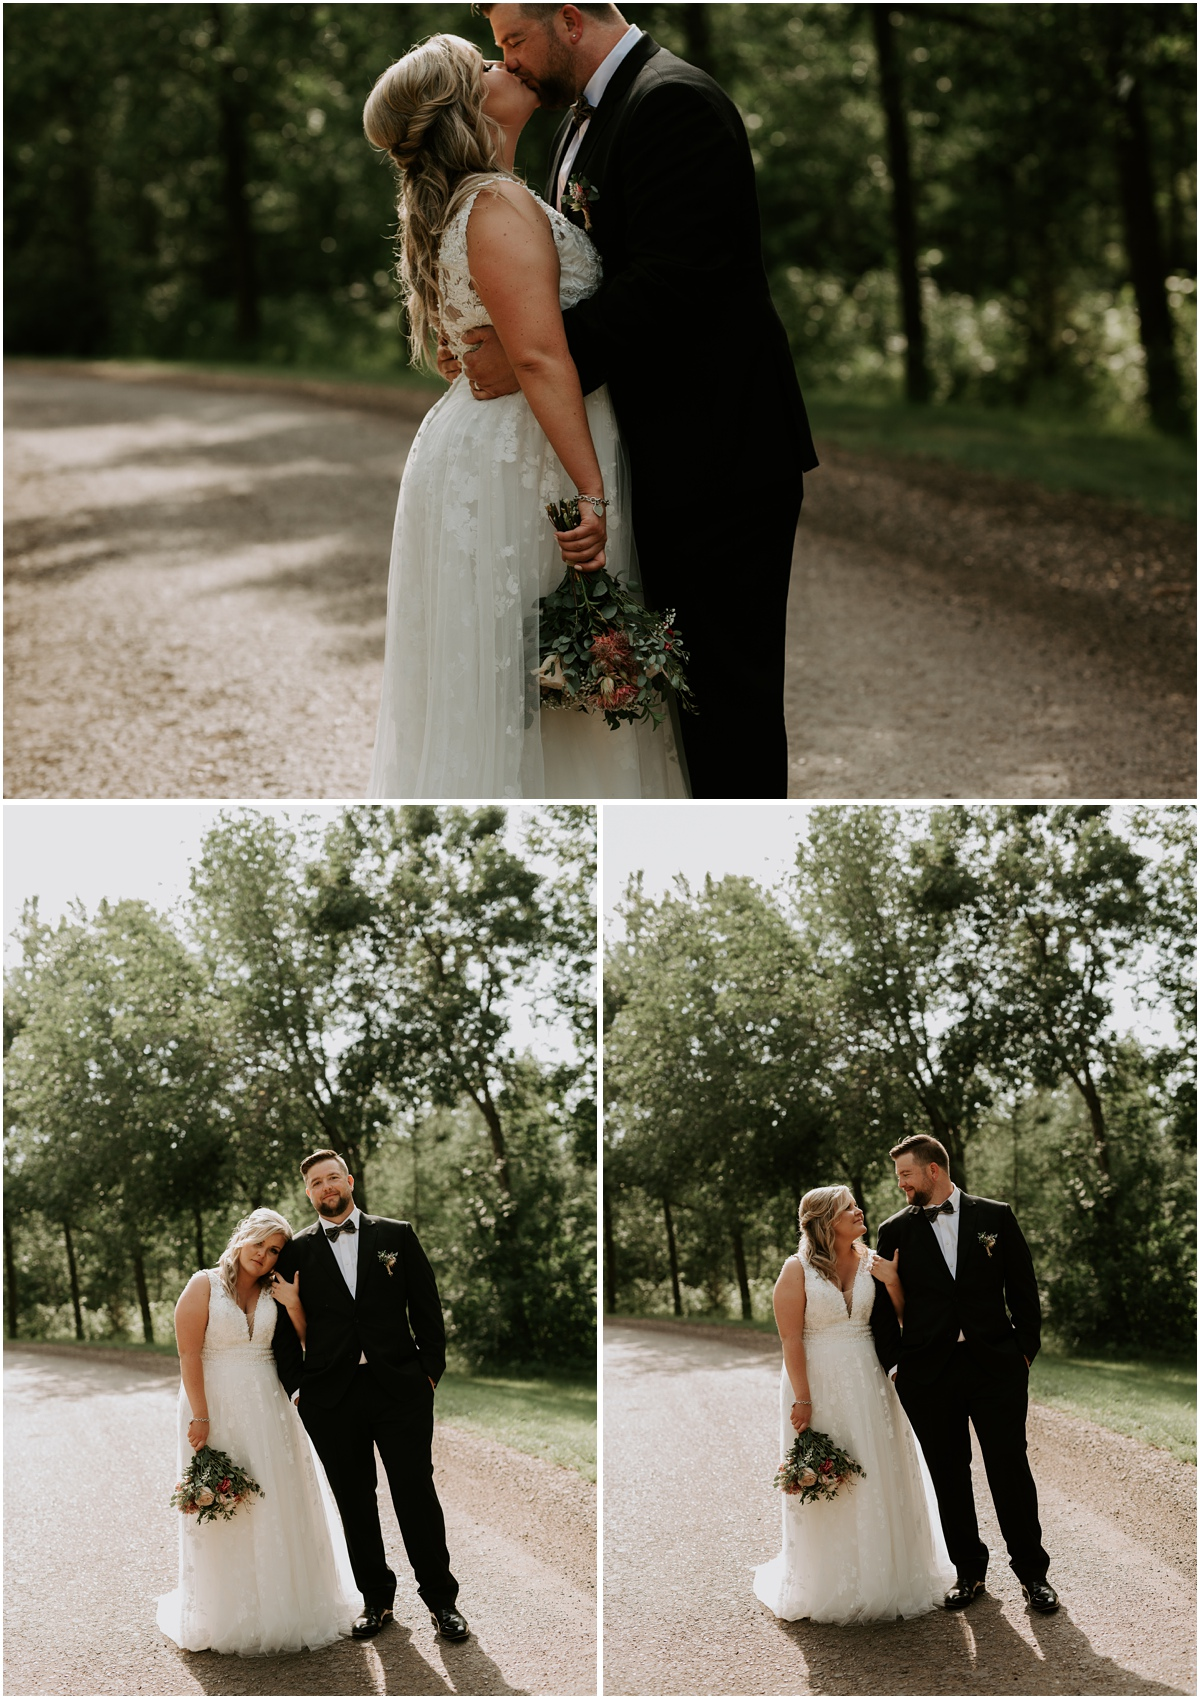 Tayler + Lamar | Sherwood Park Backyard Wedding